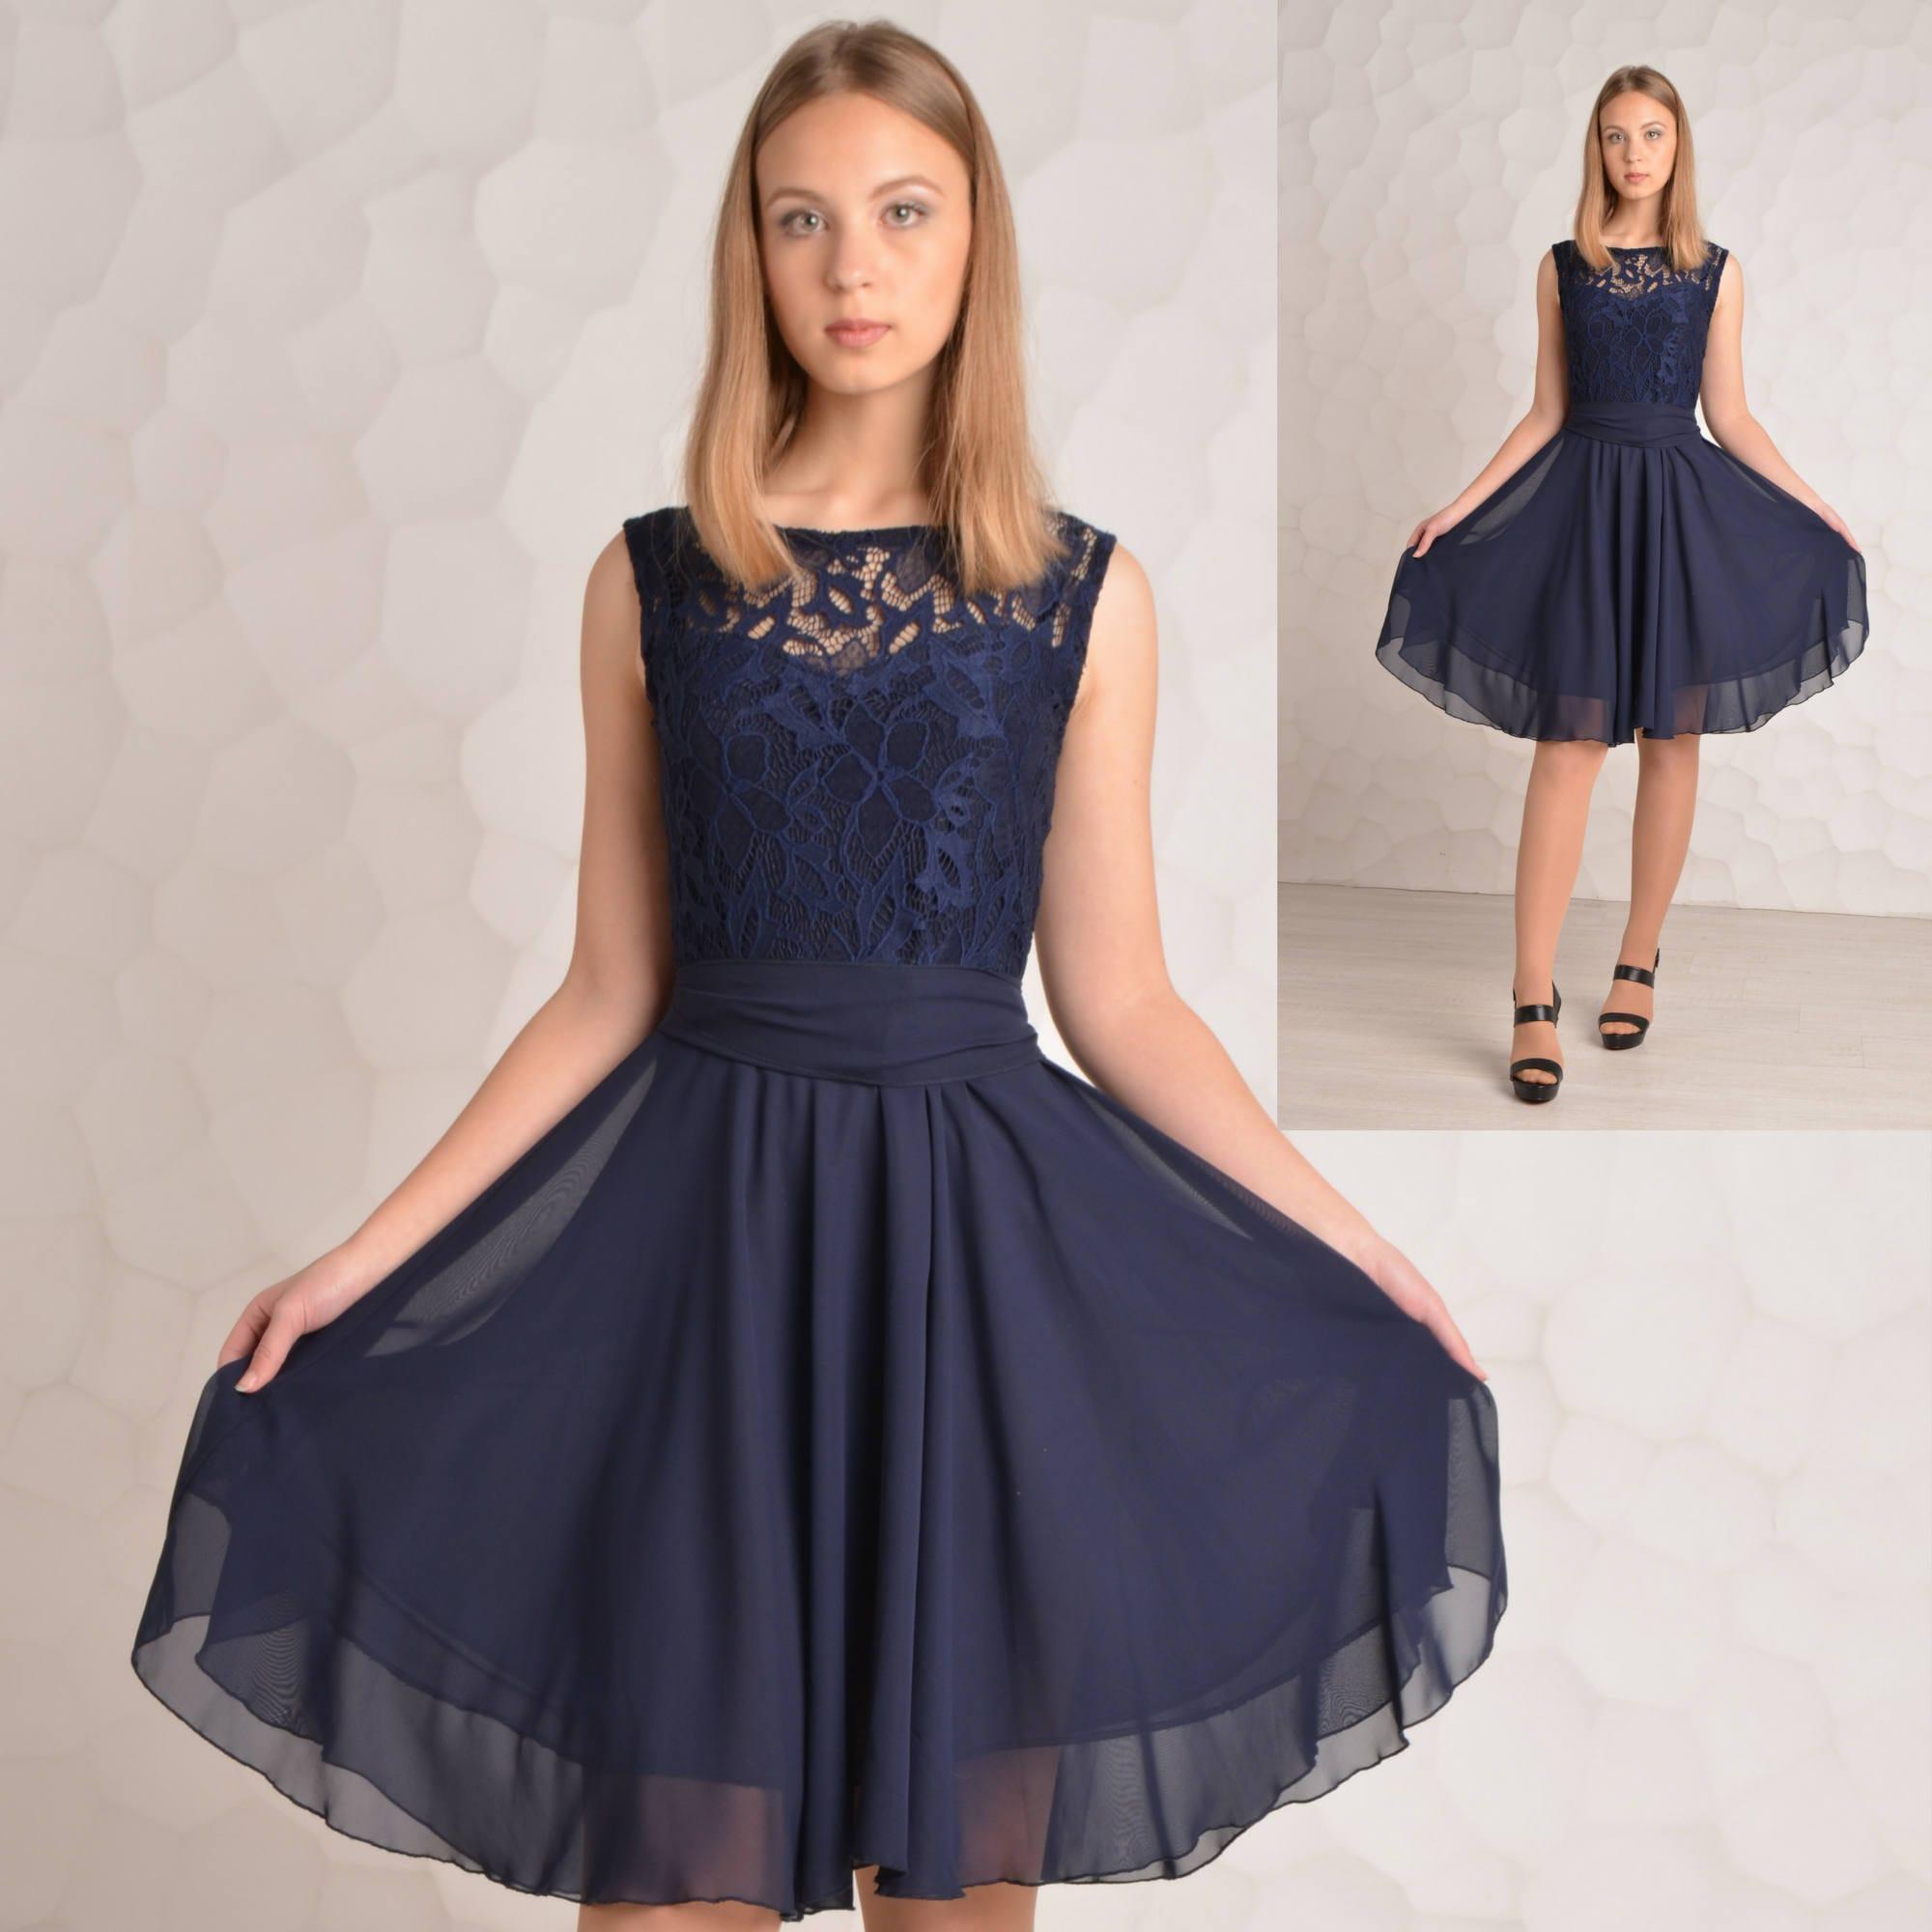 97c80bd75a026 Bridesmaid dress Navy blue Cocktail dress Bridesmaid dresses Midi dress  Short chiffon dress Lace dress Navy Blue Party dress Blue dress